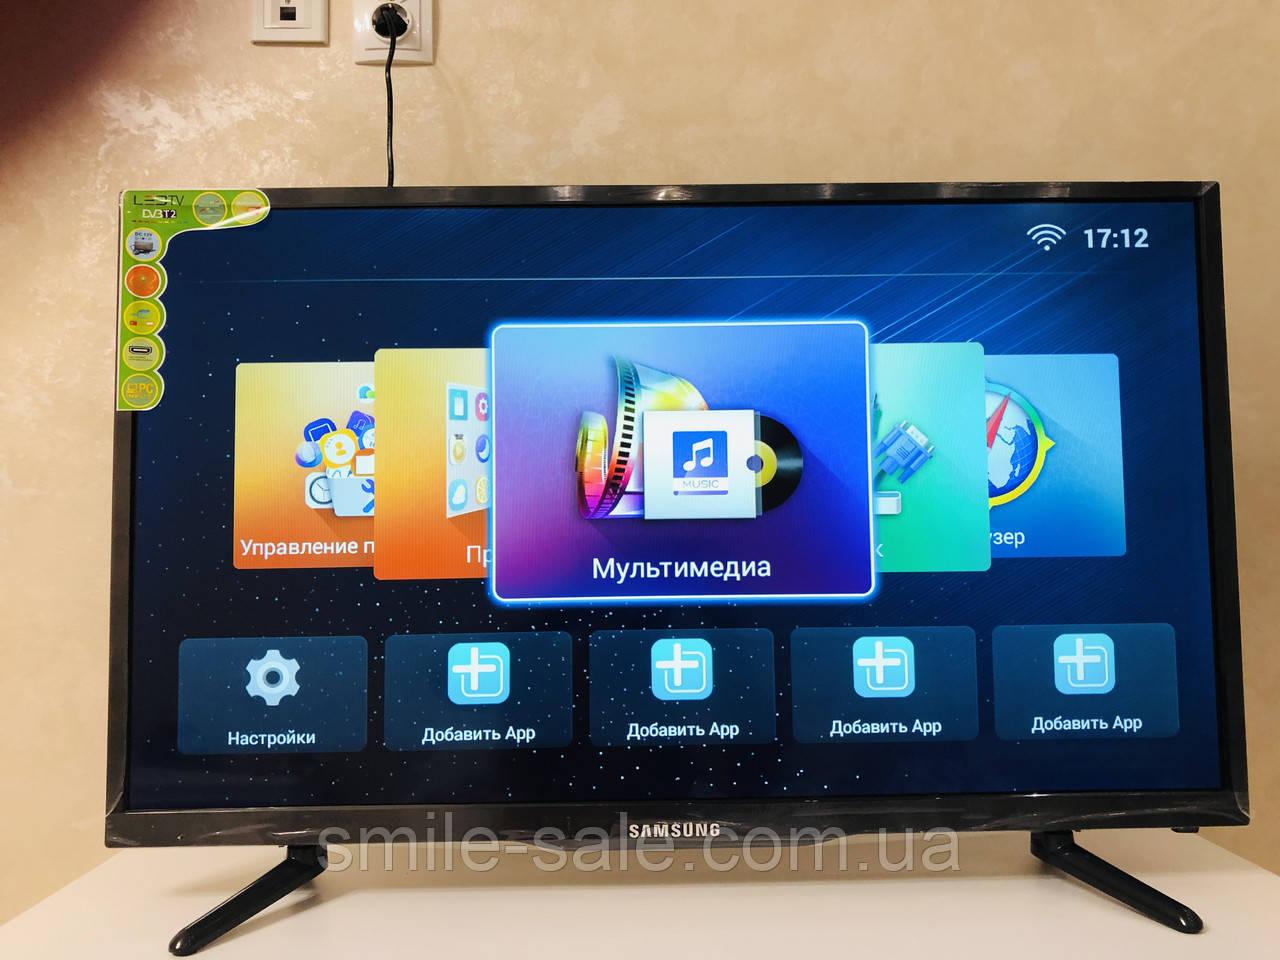 "LED-Телевизор Samsung L42 DVB 40"" Smart TV+WiFi+Т2+HDMI+USB Гарантия 1 Год!, фото 1"